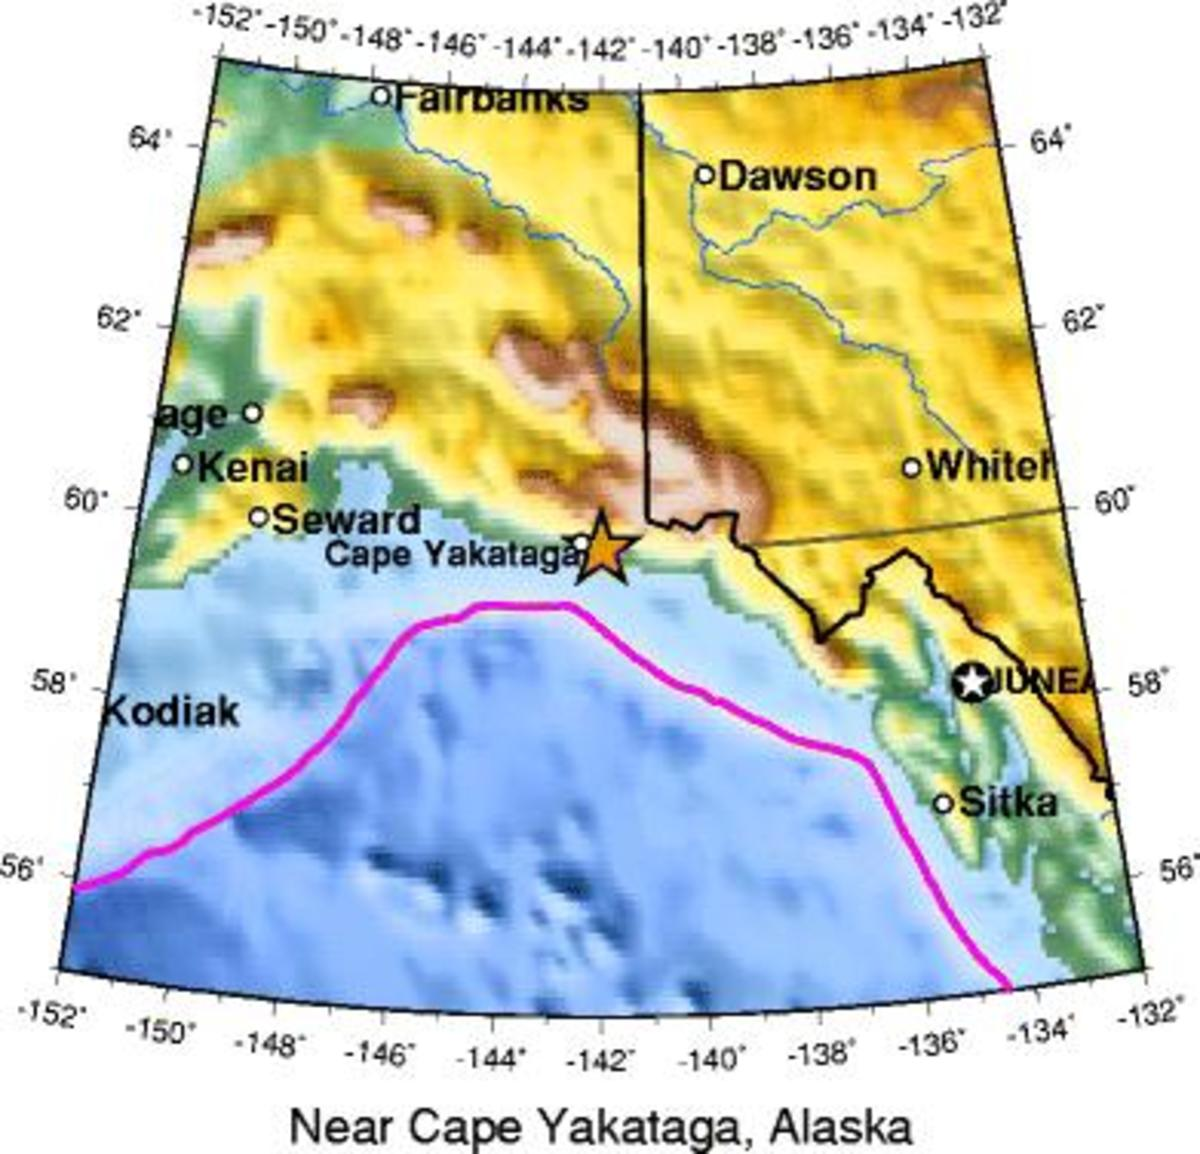 Location of earthquake